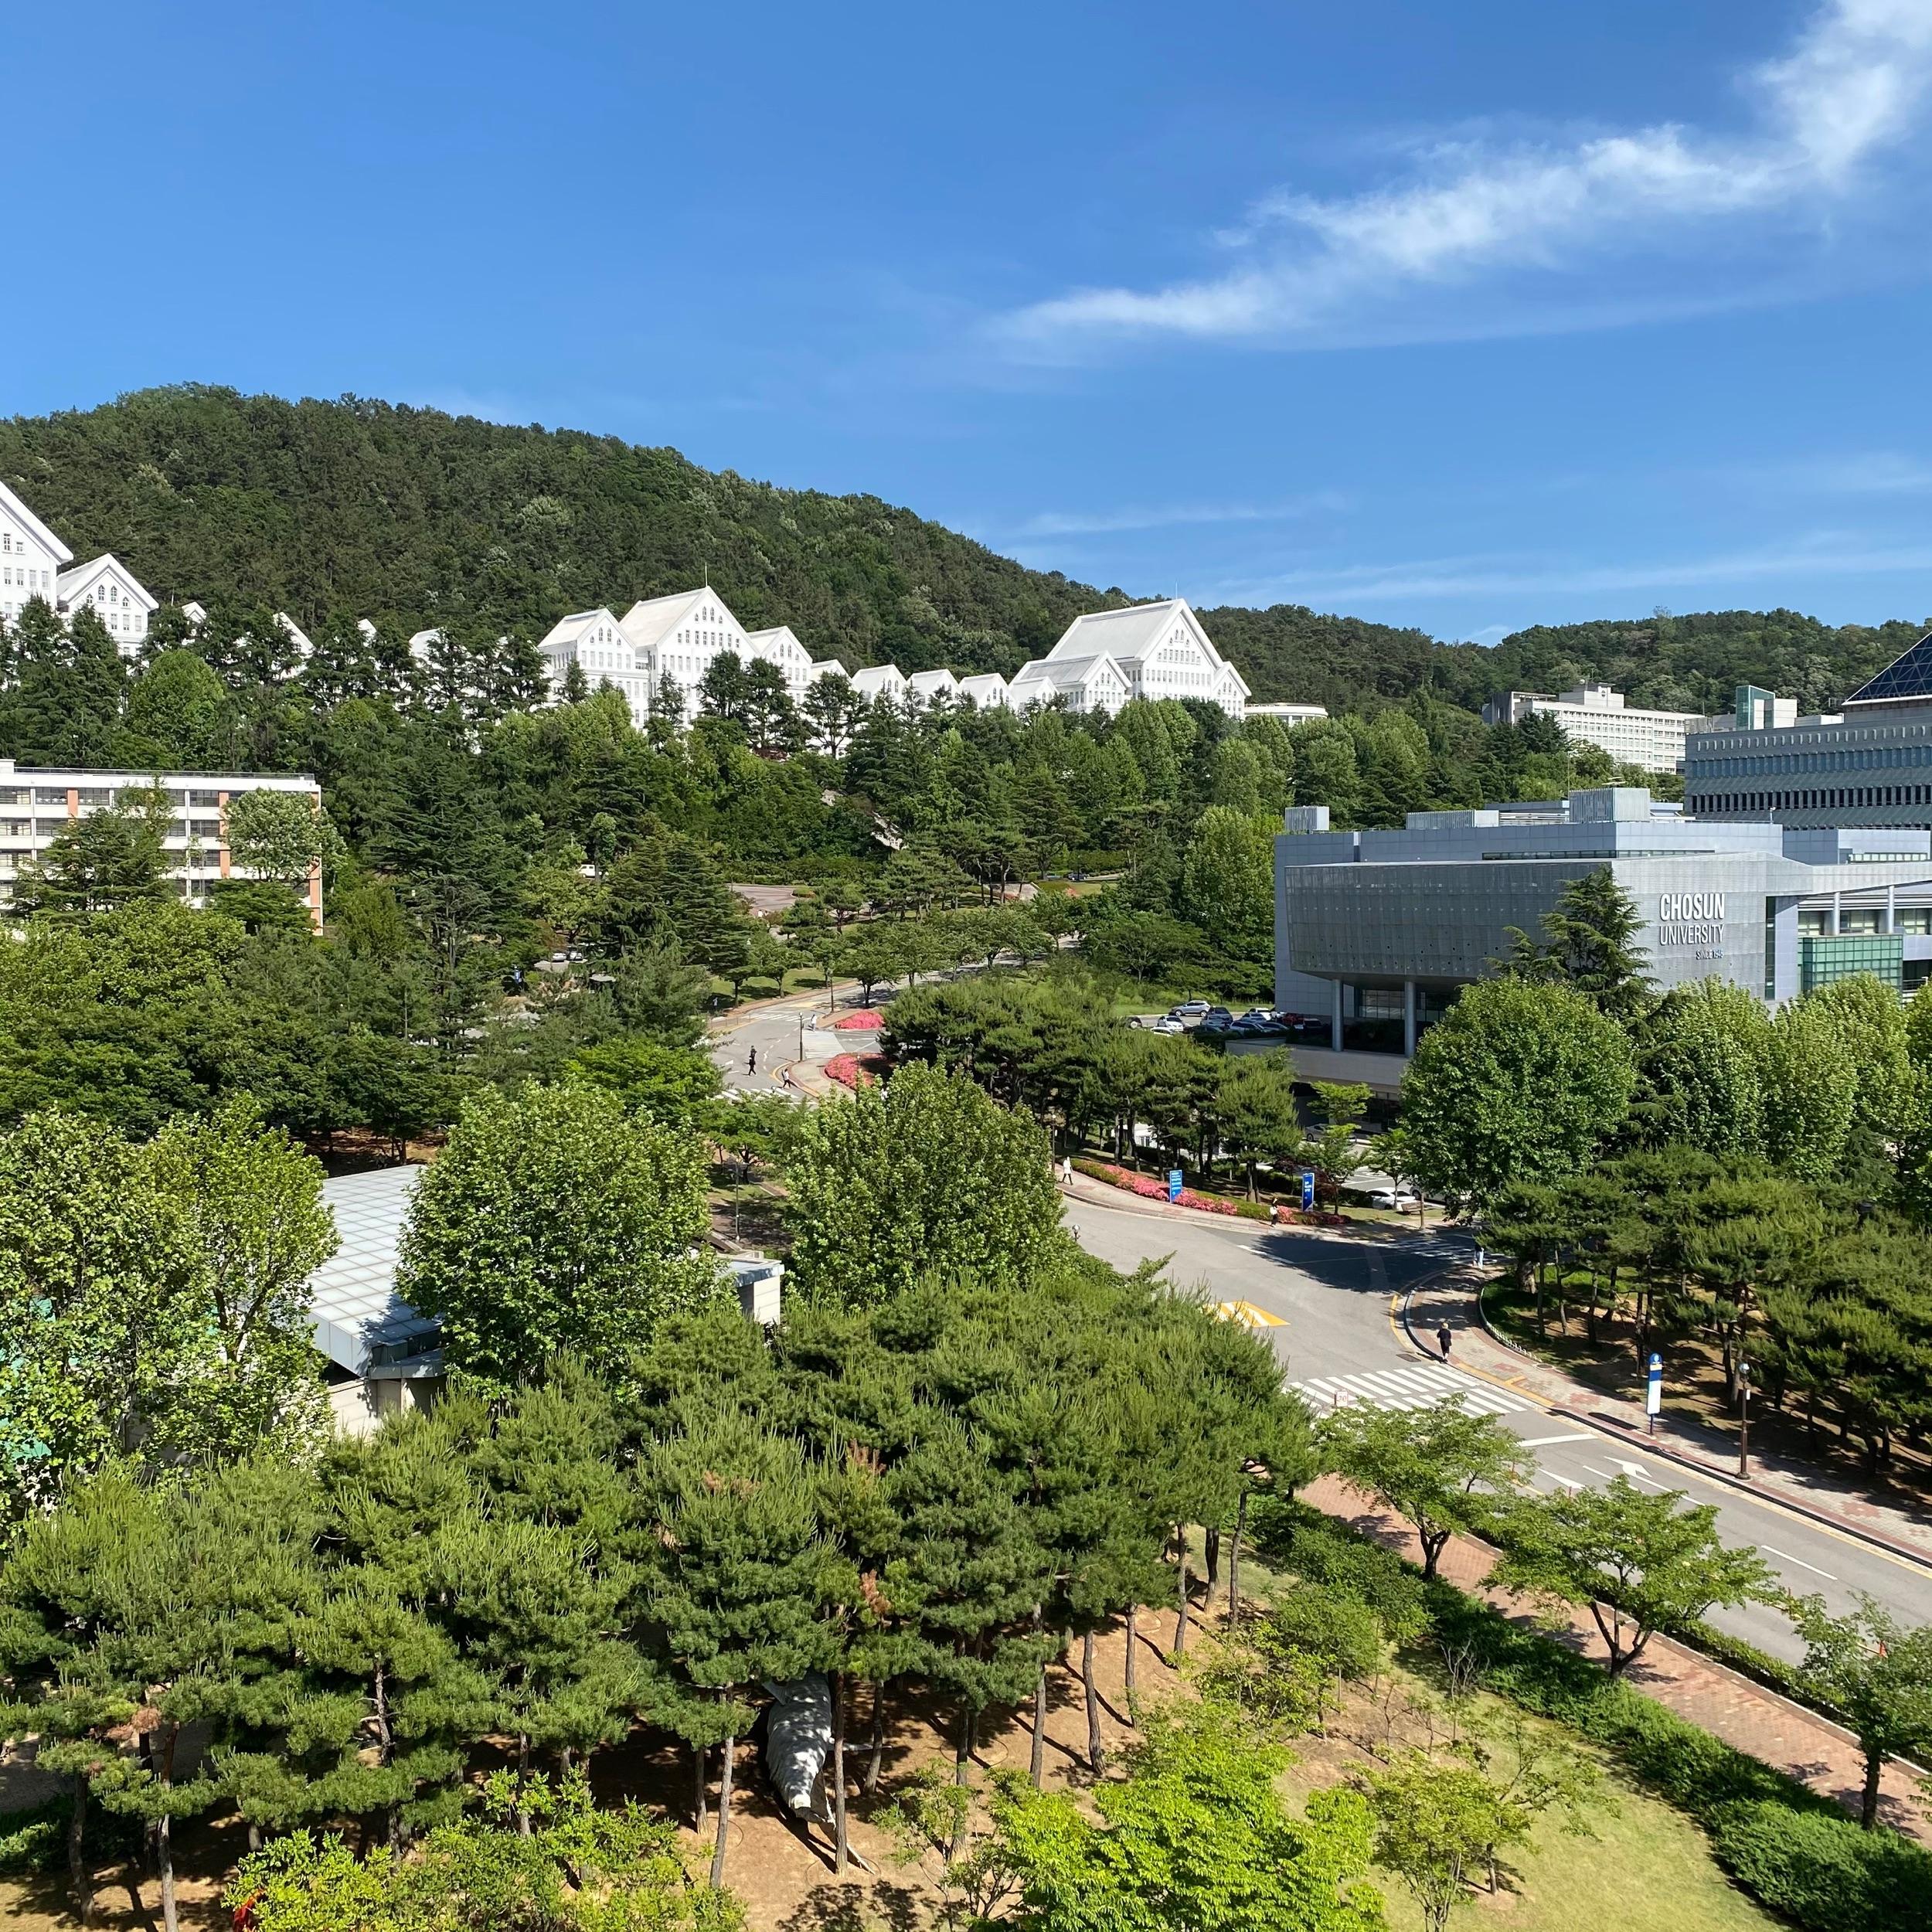 Green University